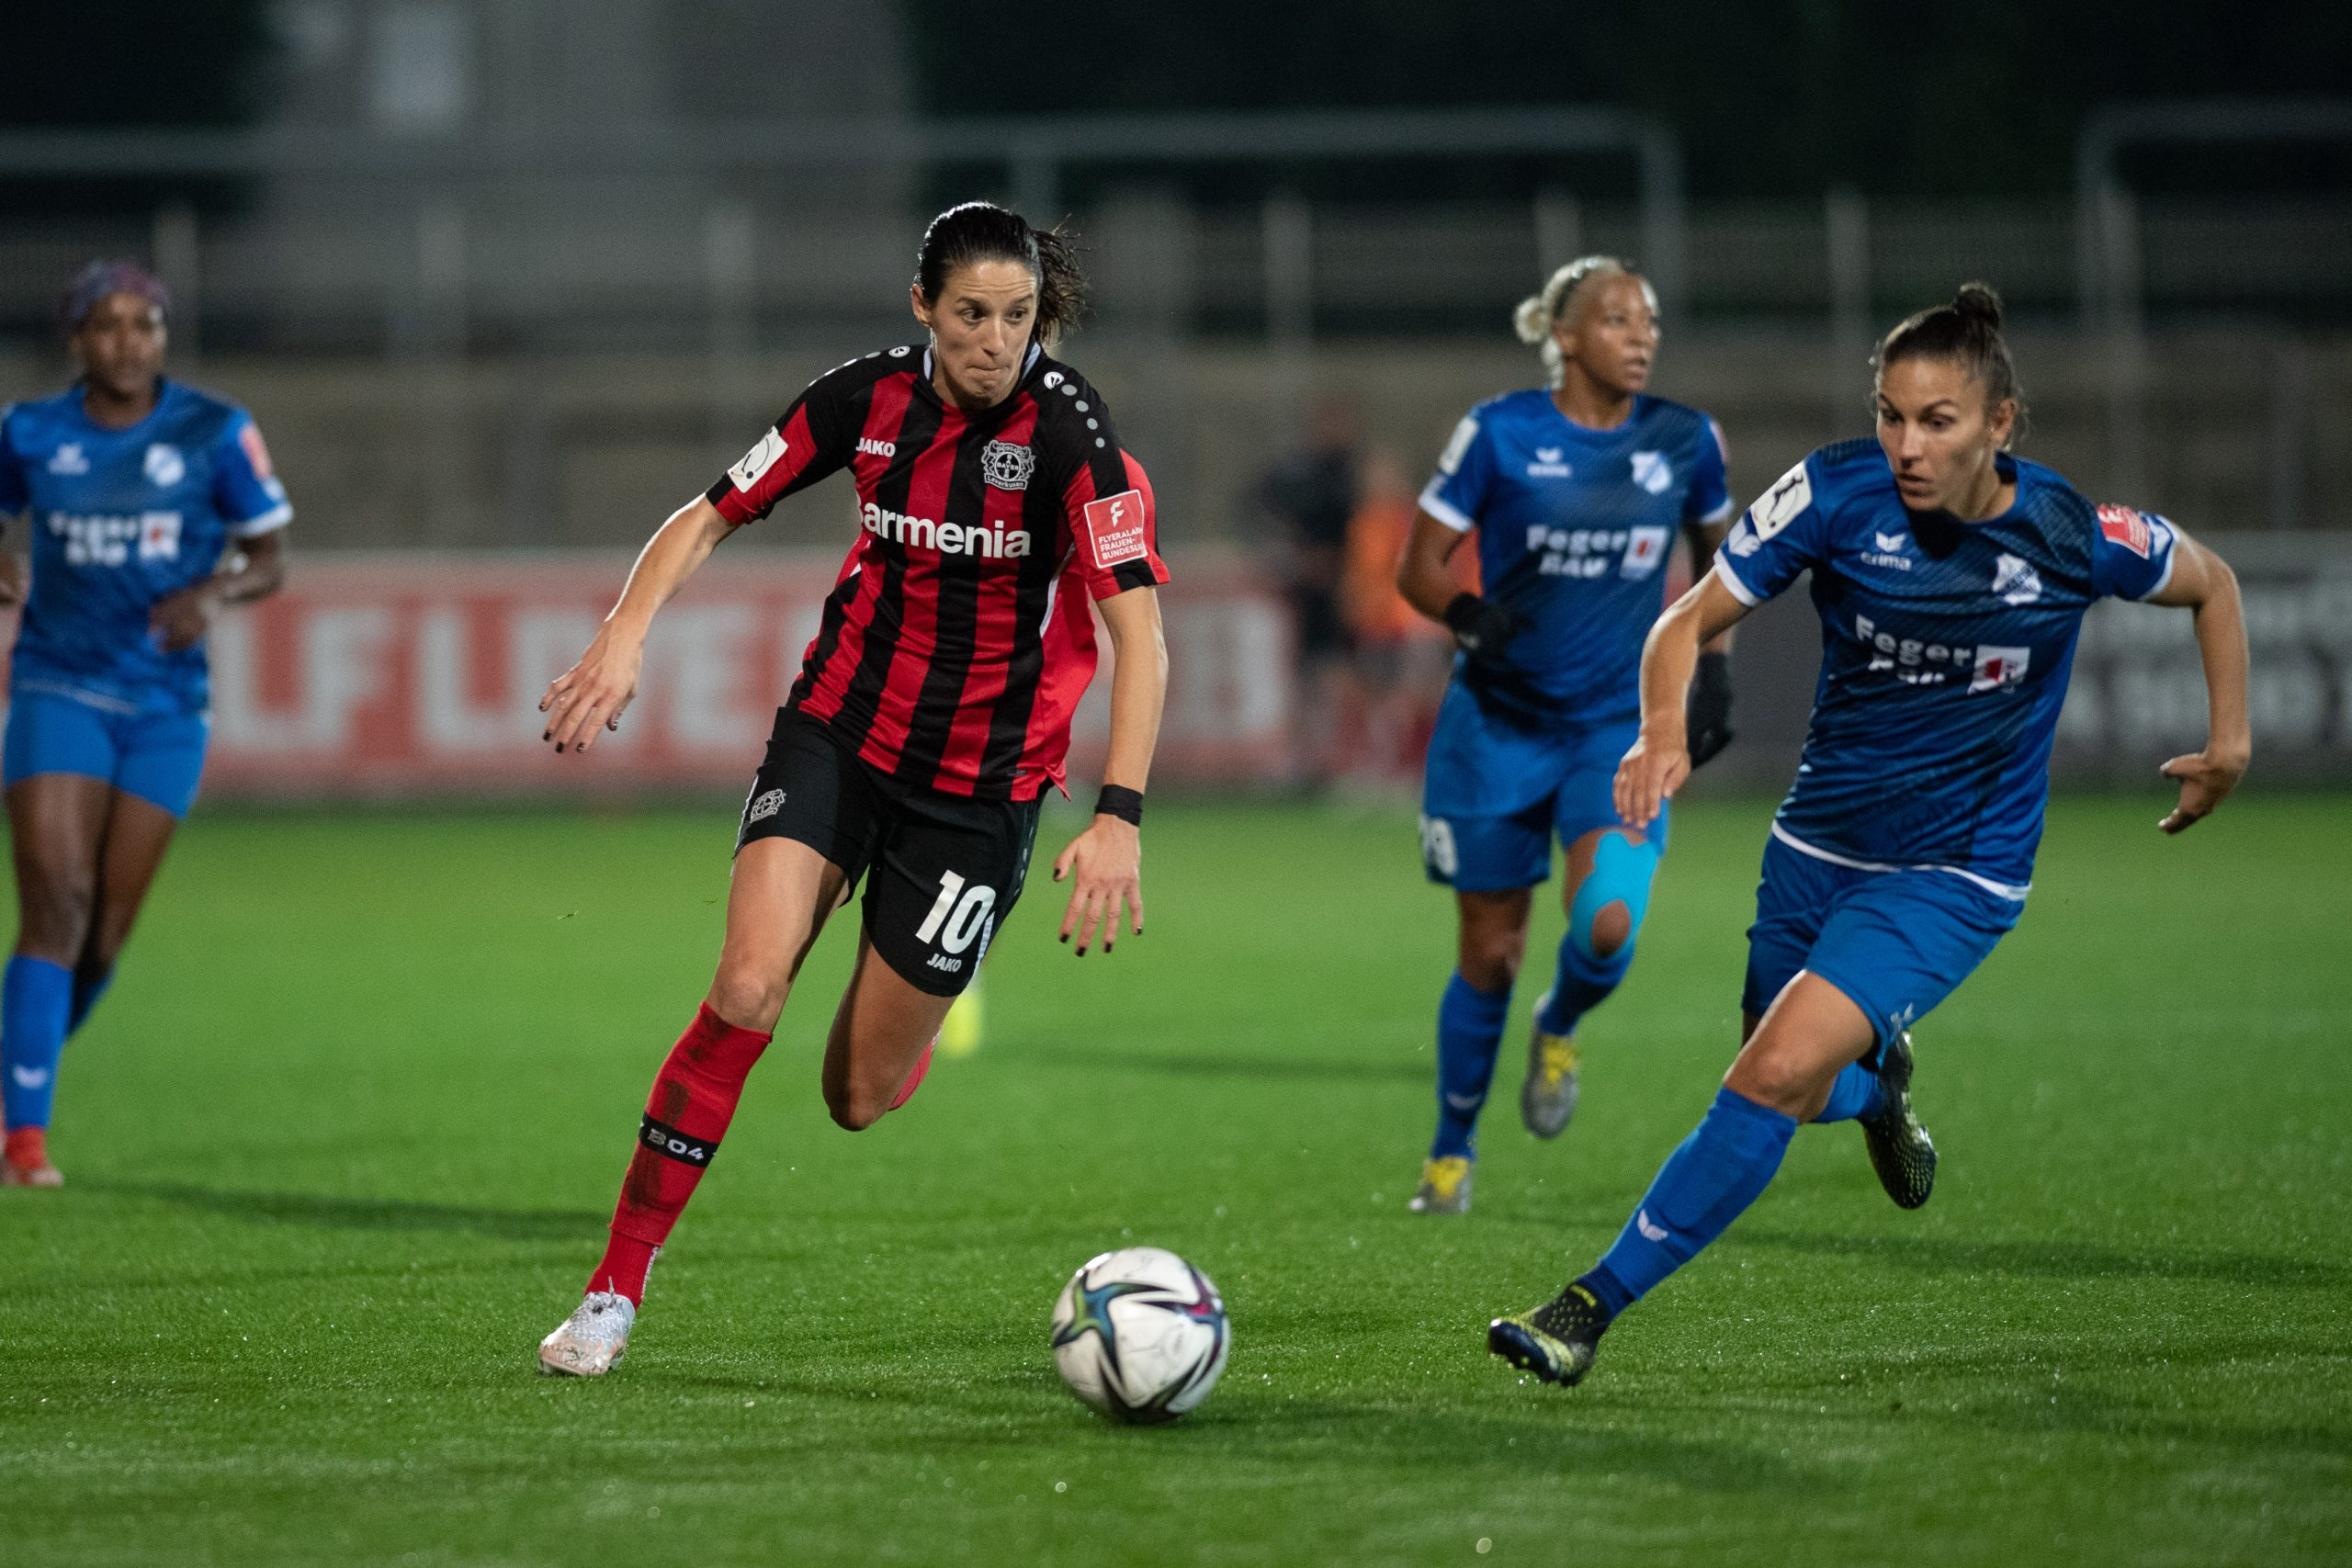 Dina preskočila duel s bivšim klubom, Milena Nikolić bez milosti